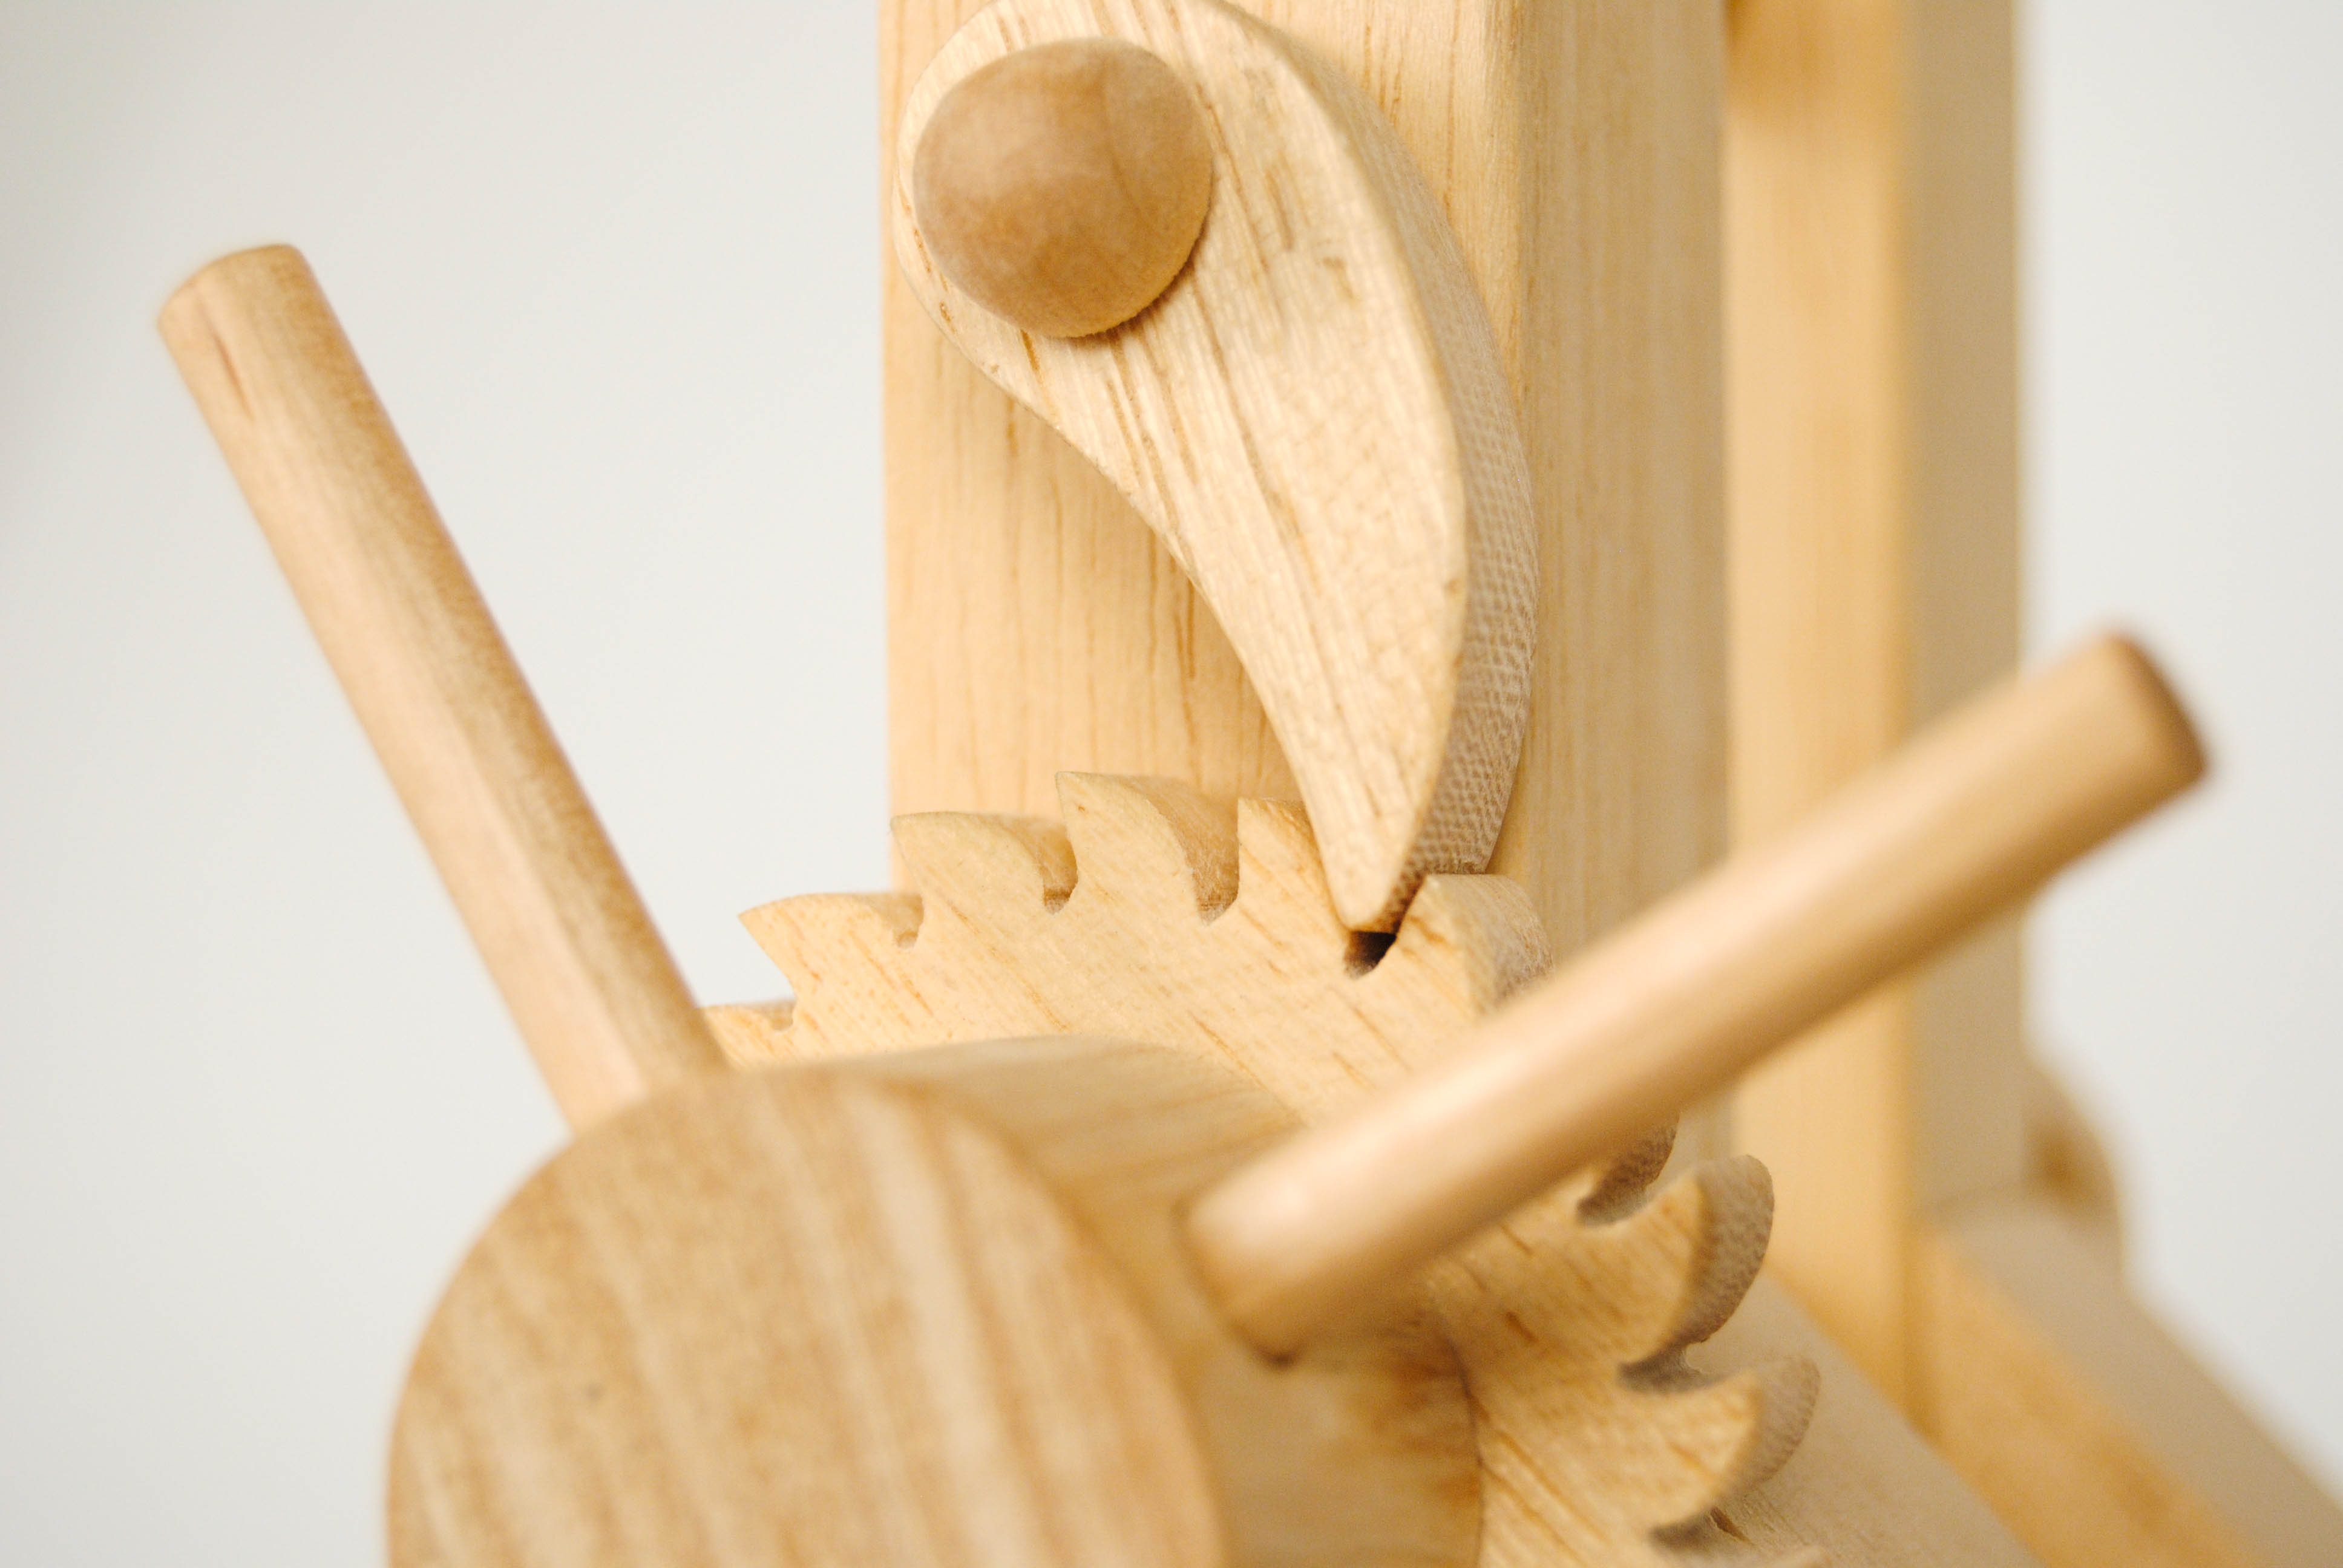 gear mechanism of leonardo da vinci wooden flexible lamp